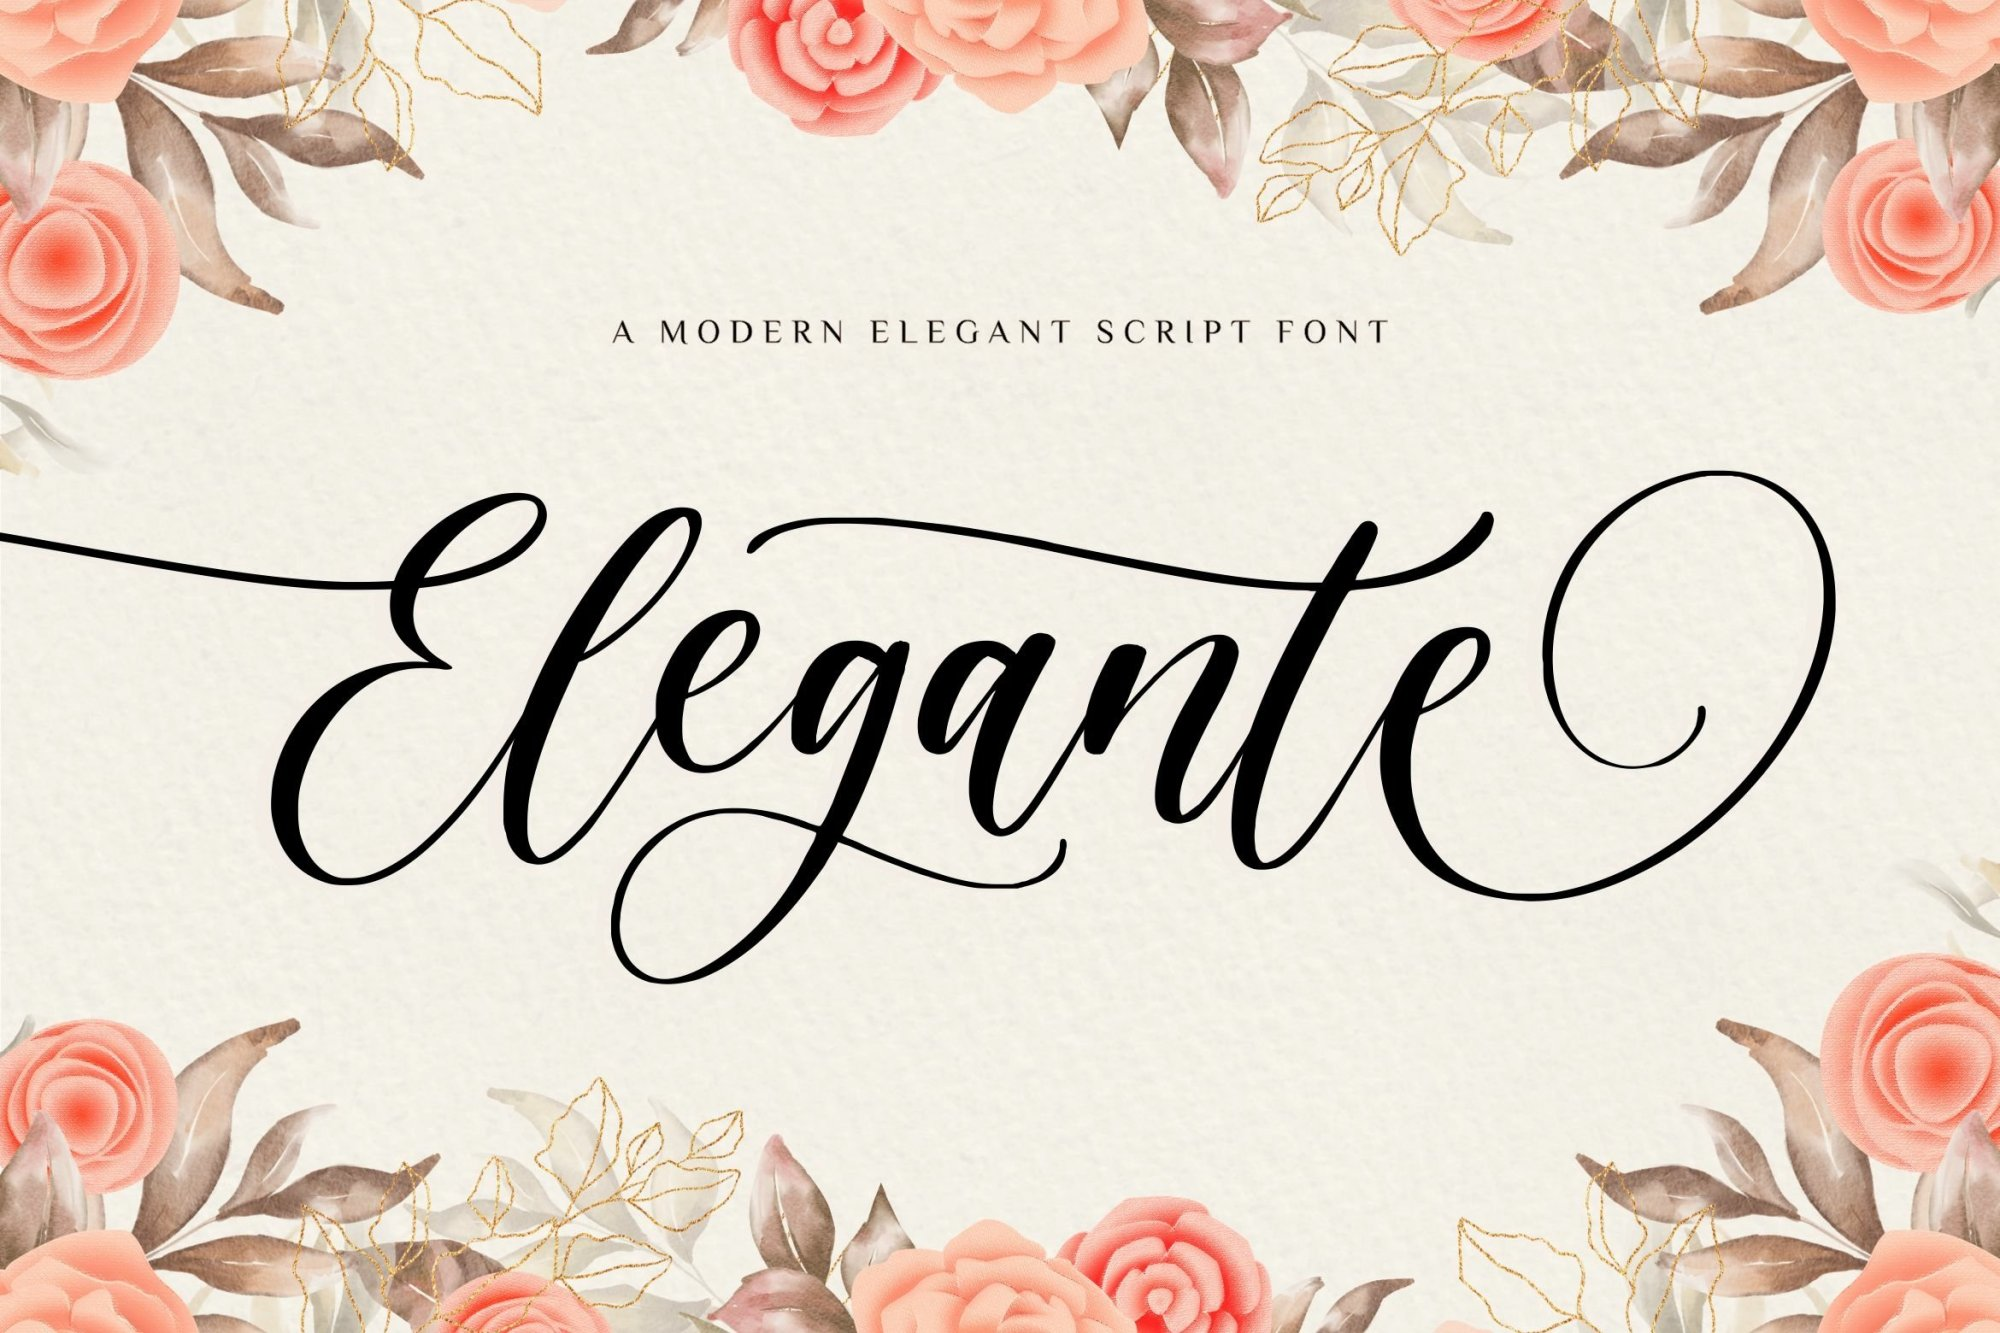 Elegante-Modern-Elegant-Font-1